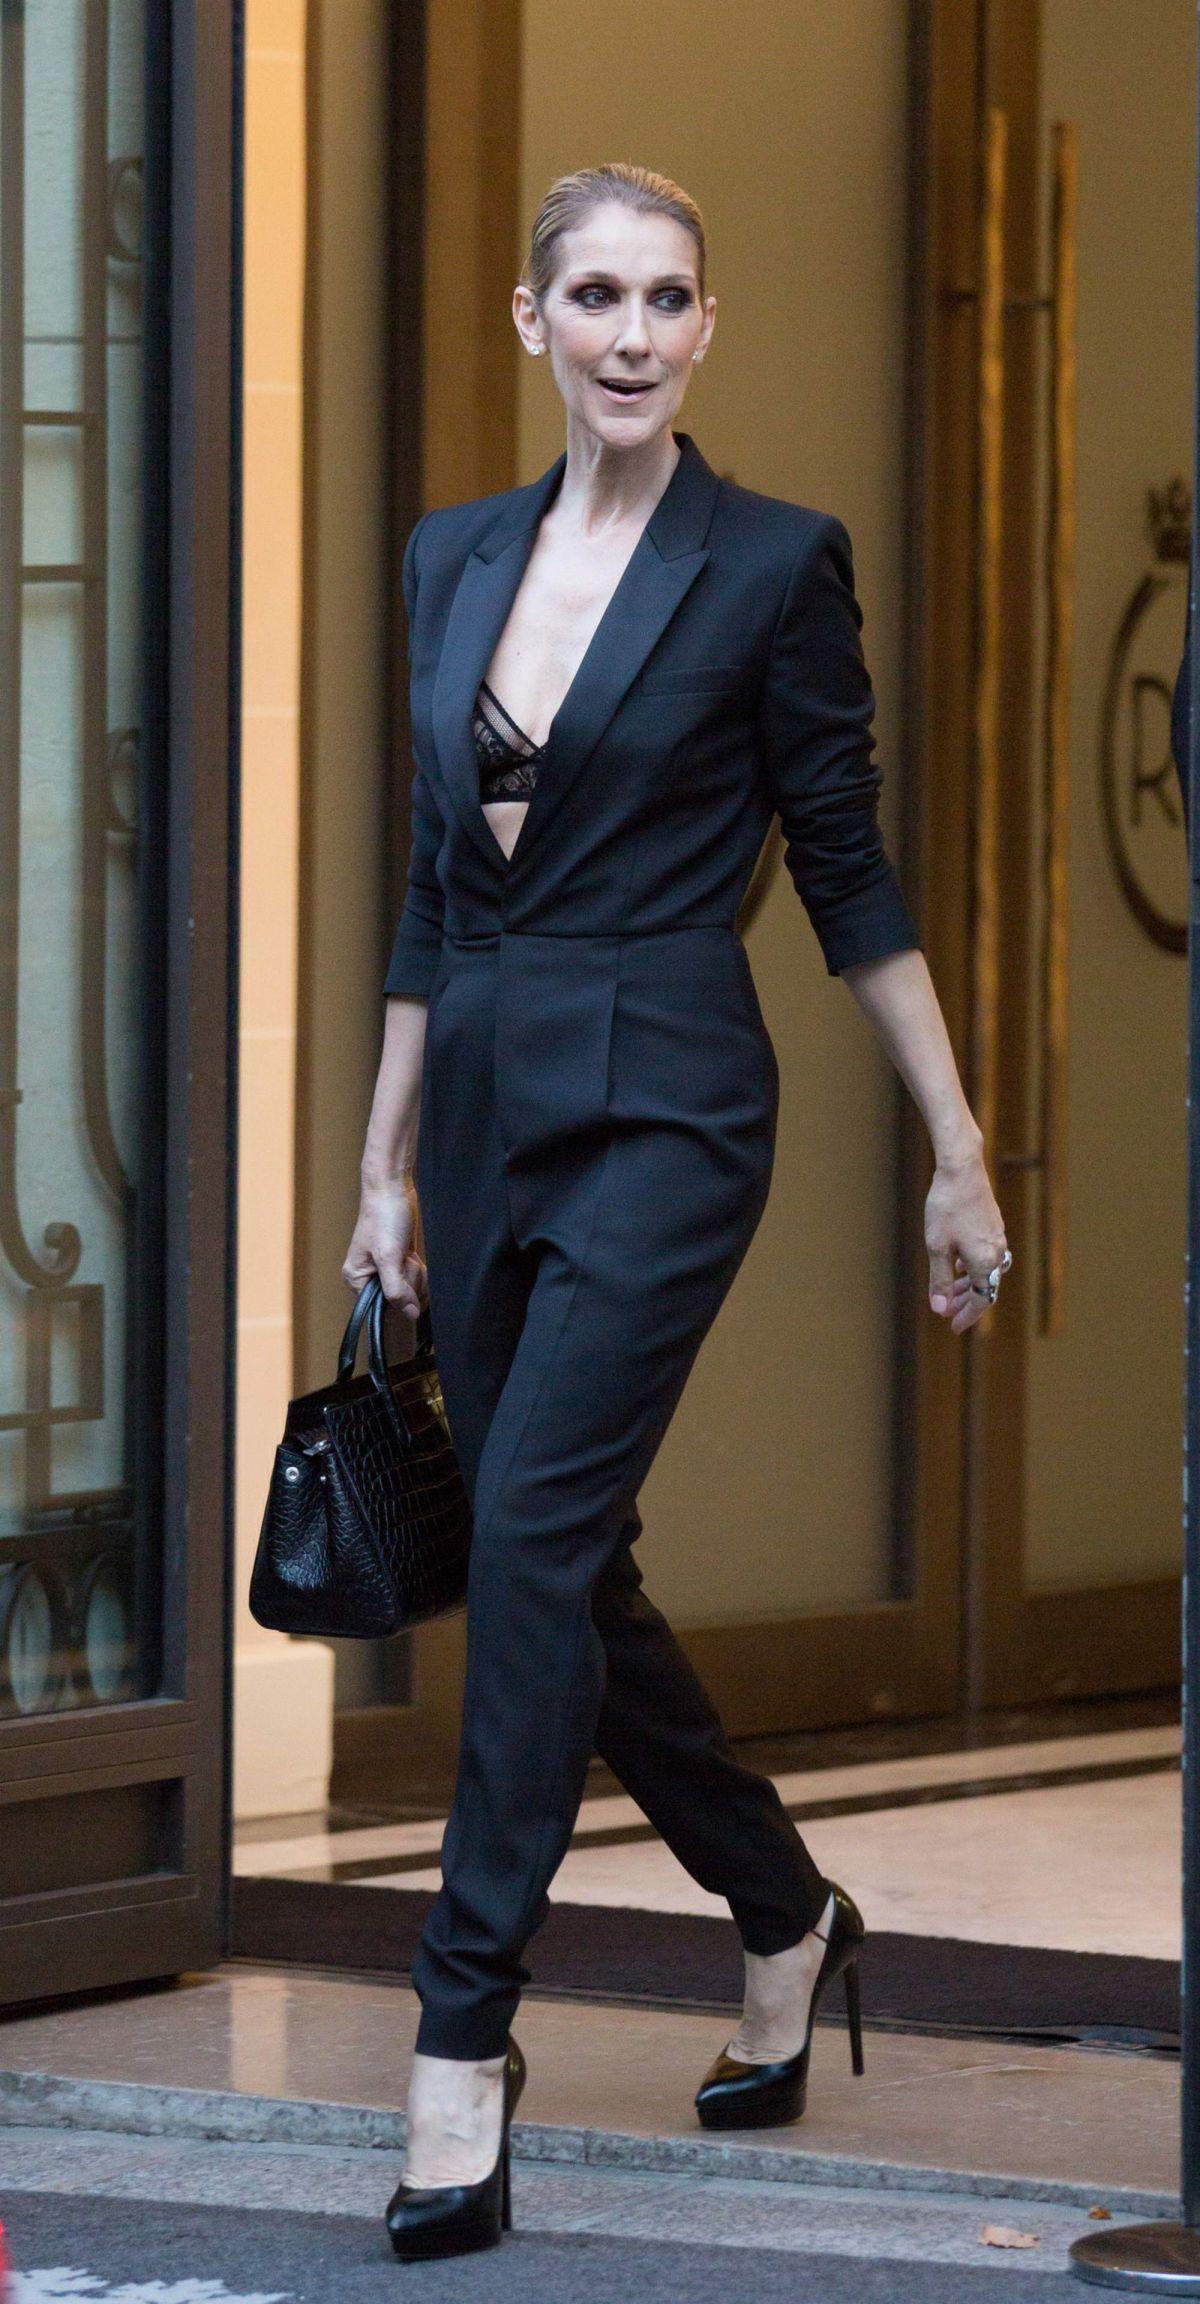 Celine Dion At Royal Monceau Hotel In Paris 07 21 2017